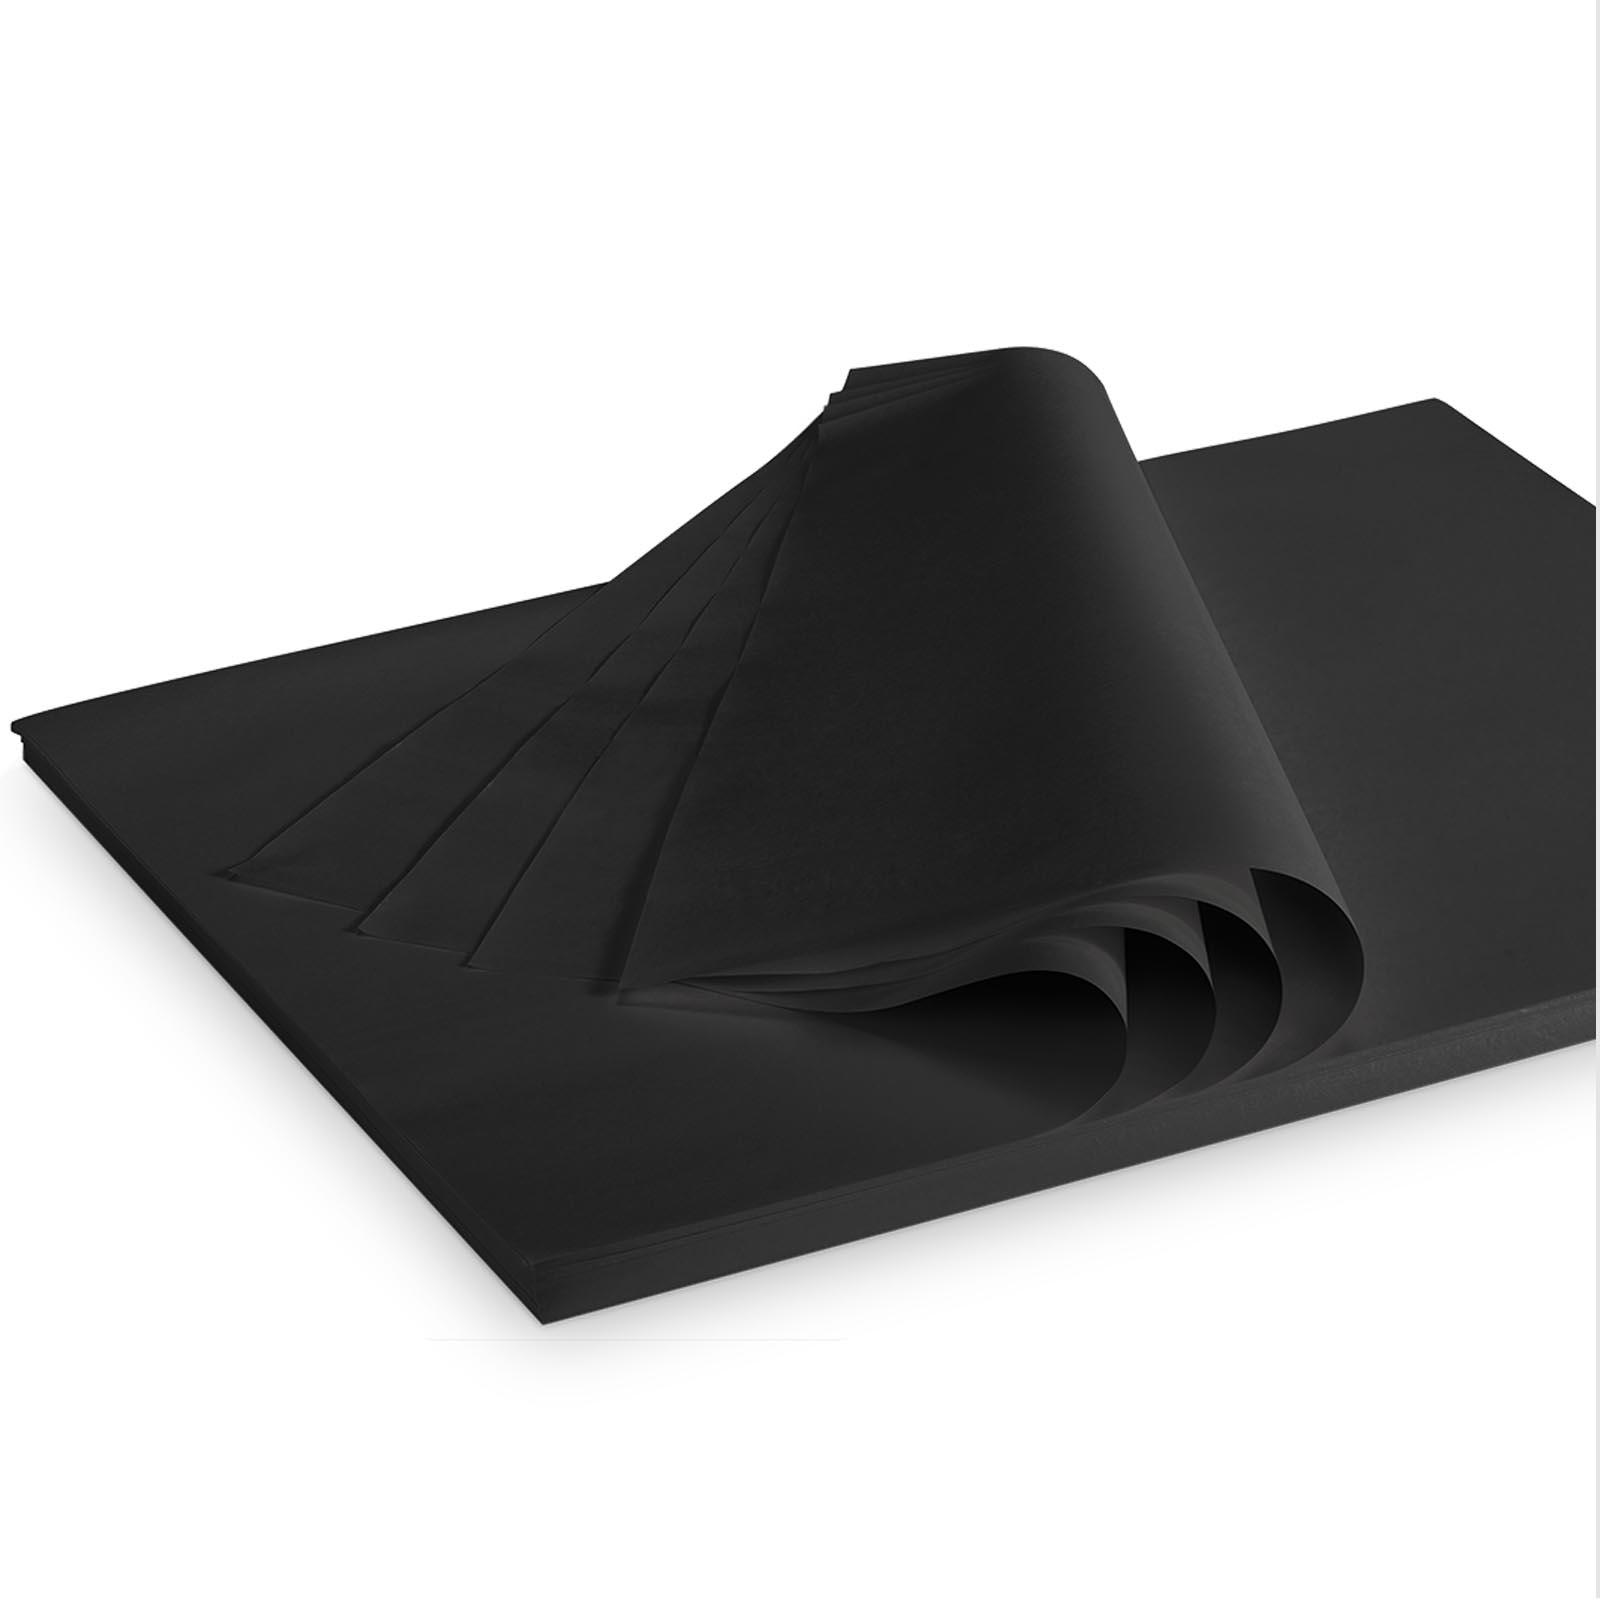 Seidenpapier schwarz 28g qm 500x375mm 2 kg blatt for Restposten dekoartikel